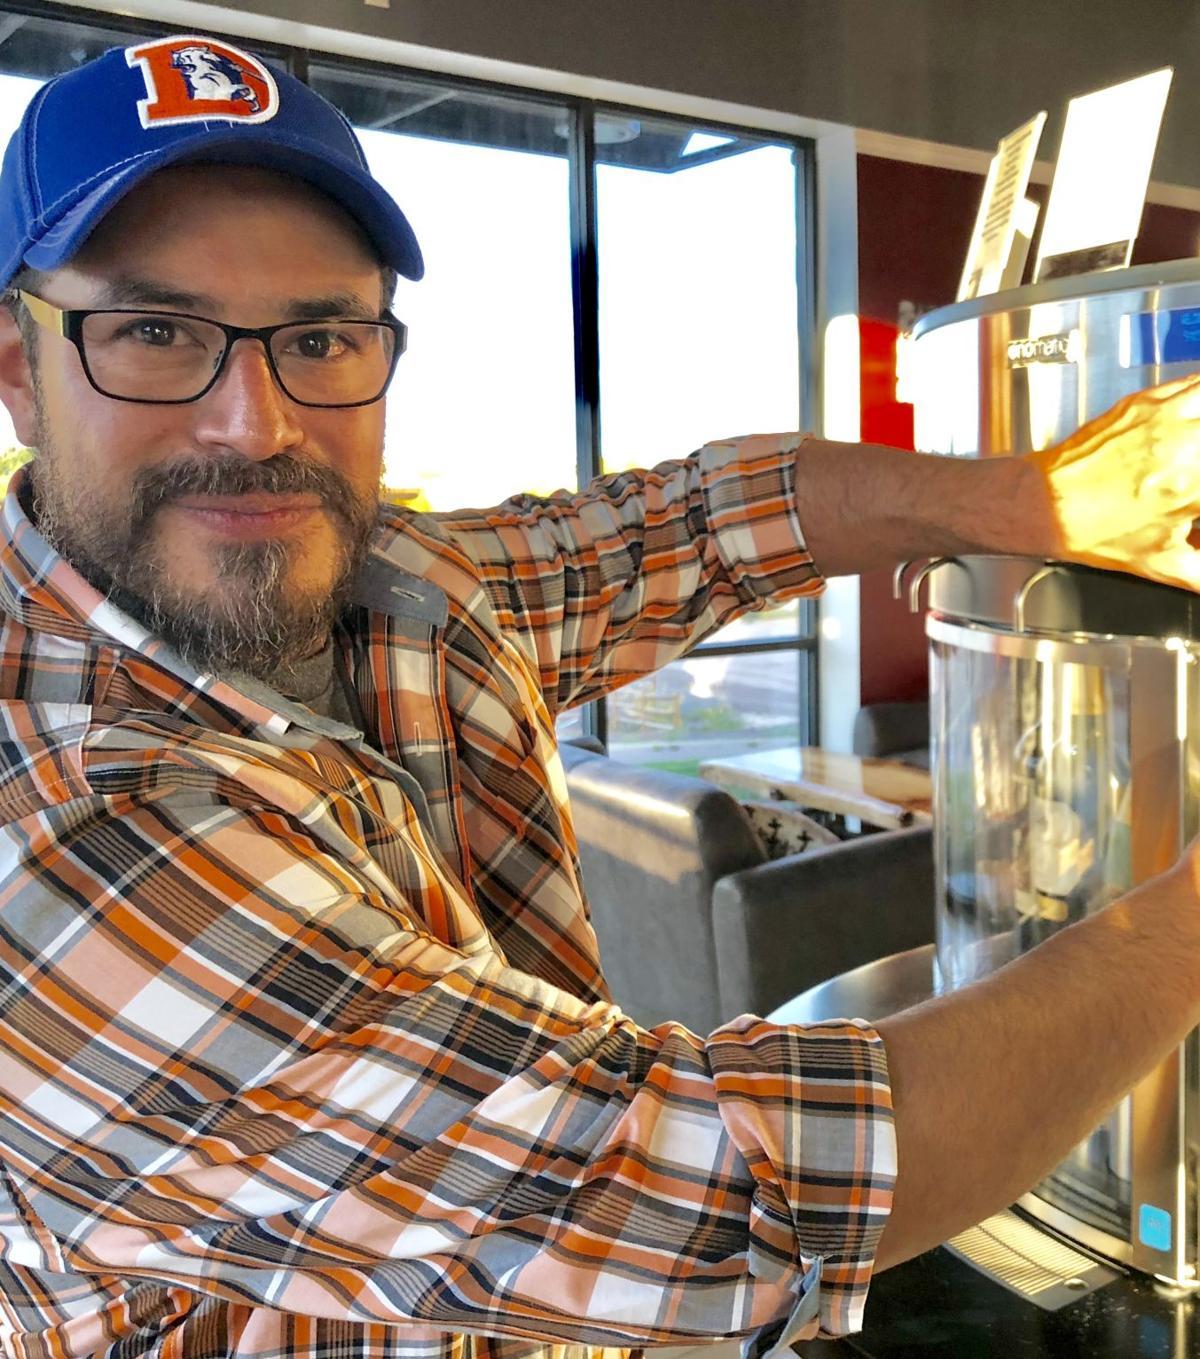 Colorado Springs coffee shop has hit refresh button to upgrade menus and expand patio